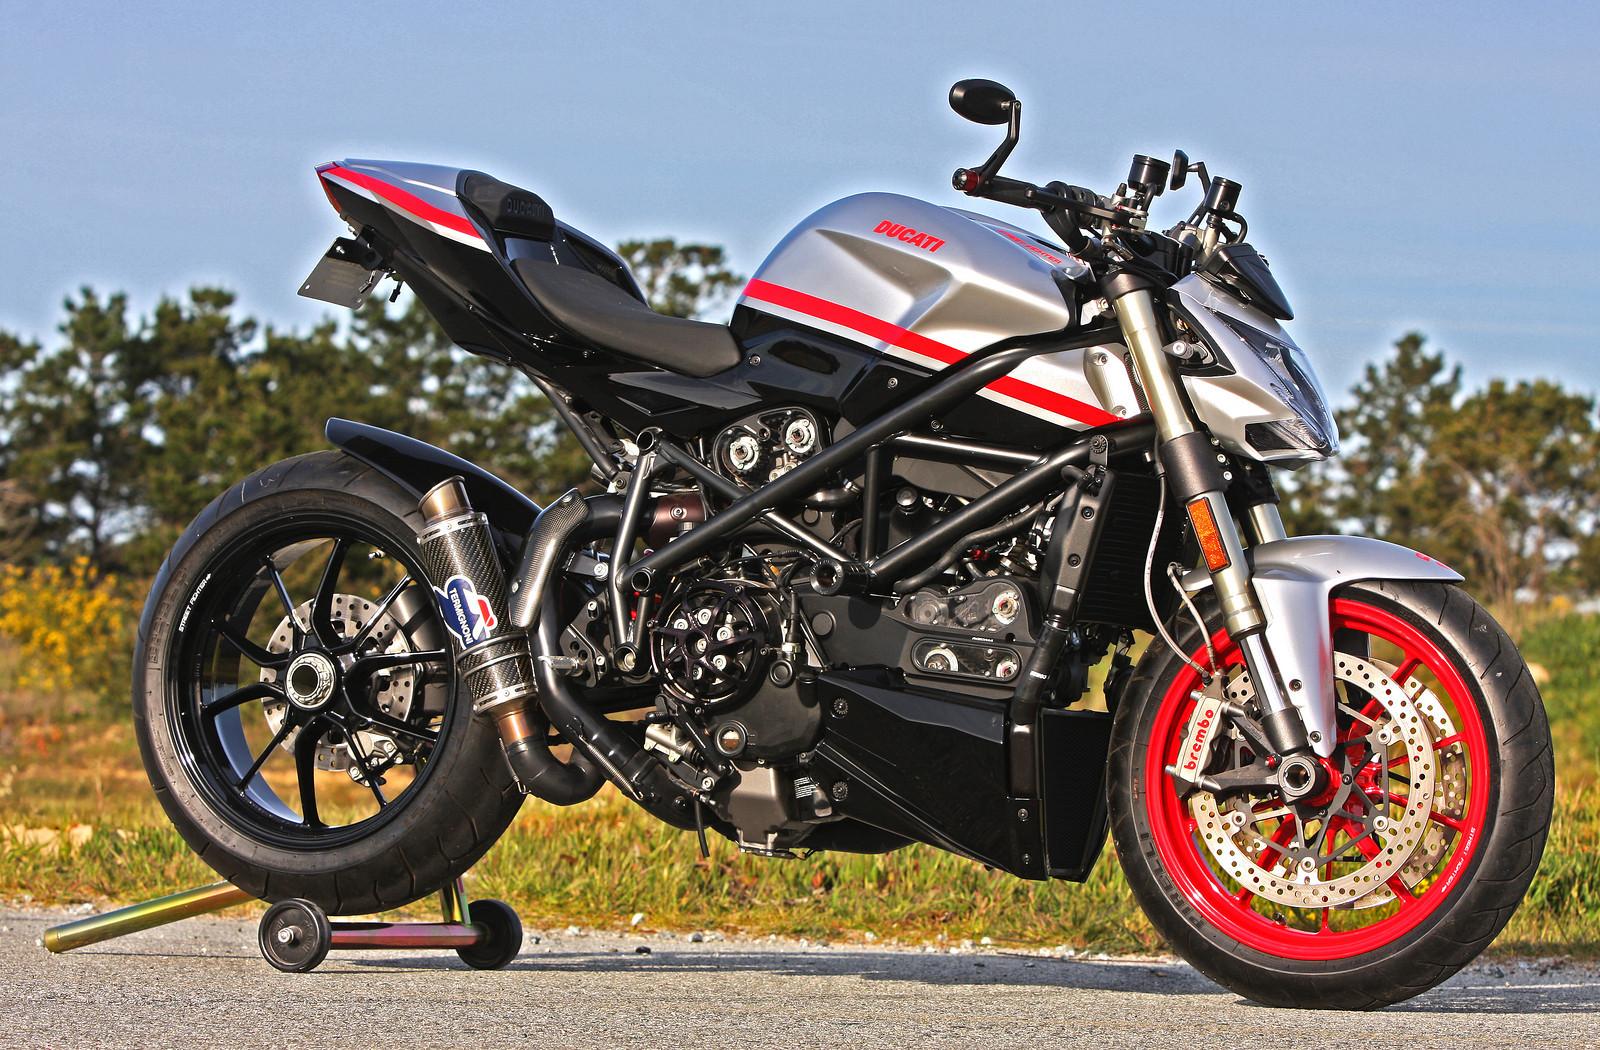 Racing Caf U00e8  Ducati Streetfighter  U0026quot Corse U0026quot  By Finishing Touch 4u